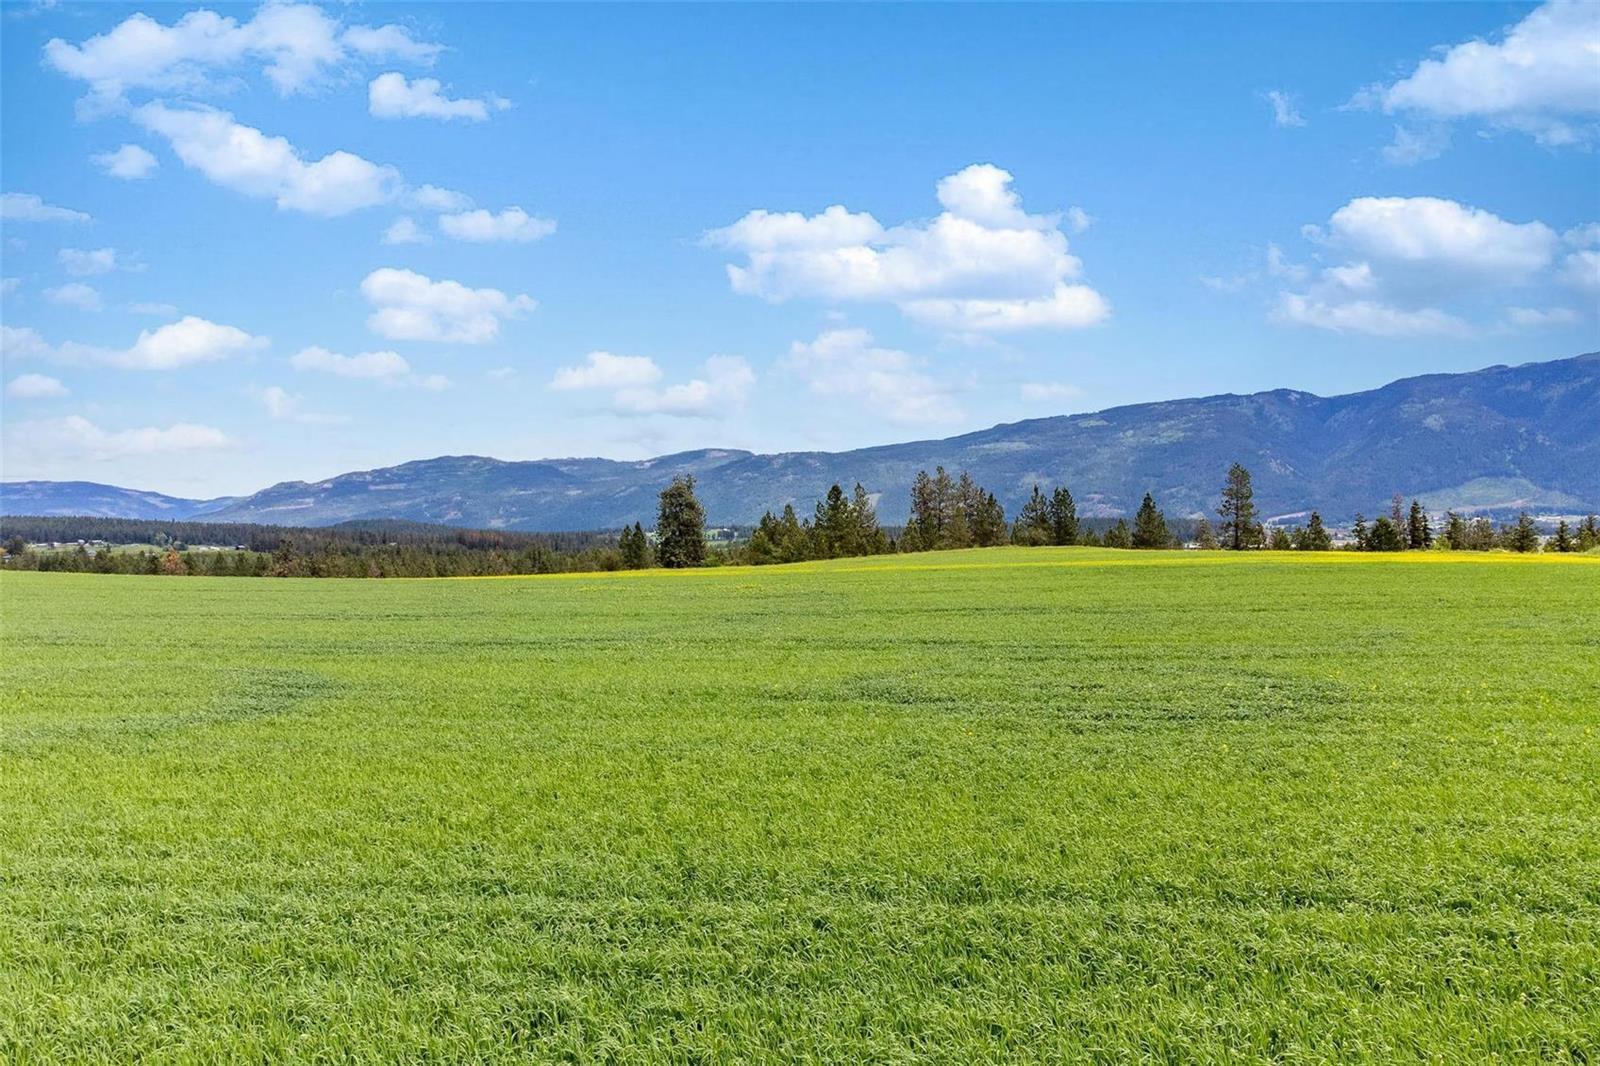 4602 Schubert Road,, Armstrong, British Columbia  V0E 1B4 - Photo 1 - 10232684